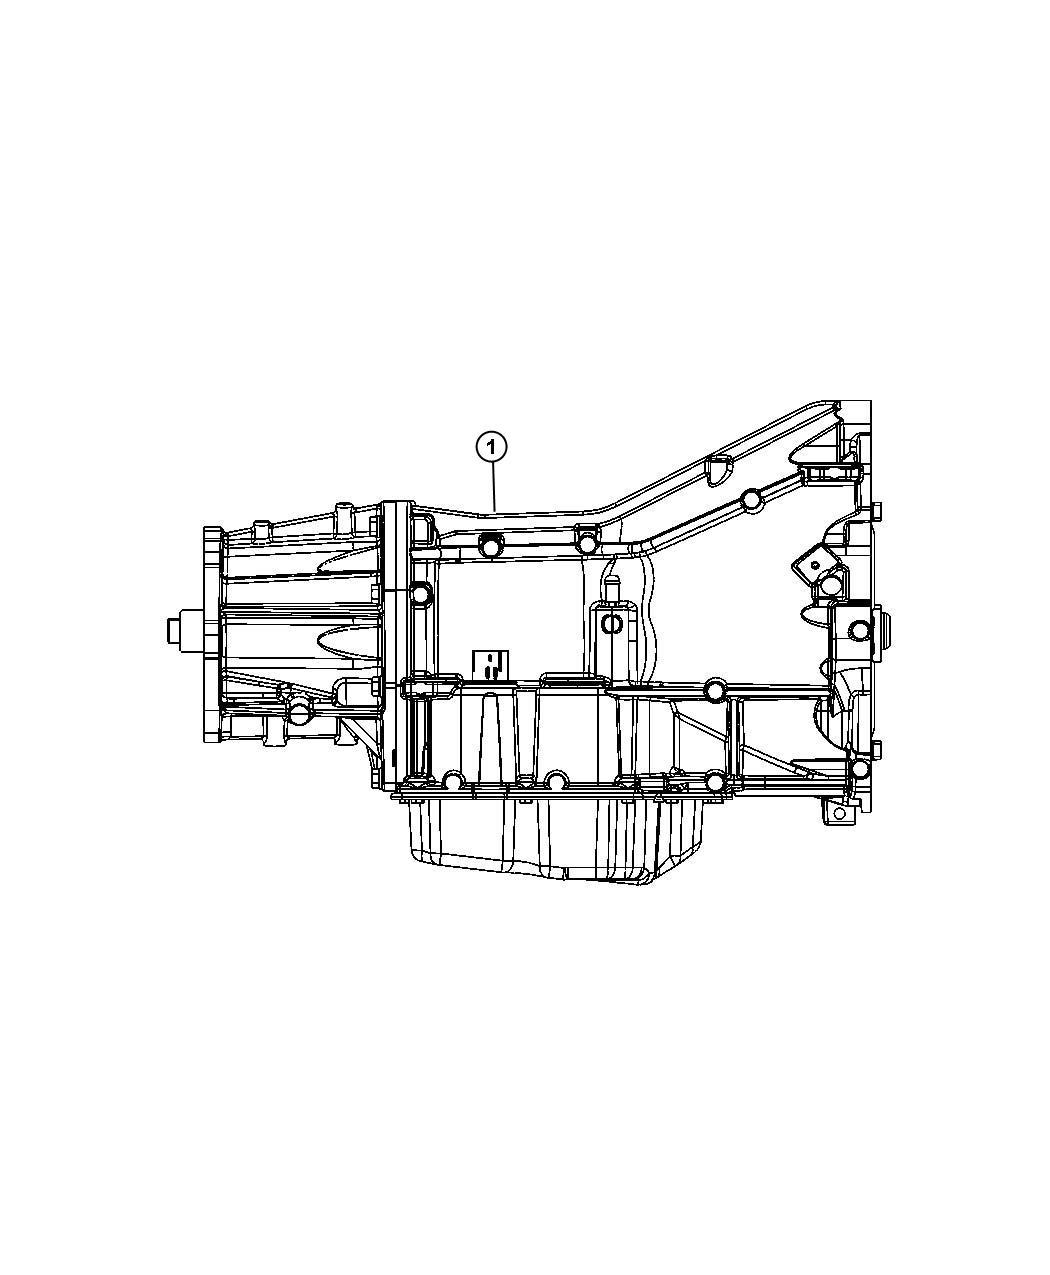 Jeep 42rle Transmission Diagram | Wiring Diagram Database